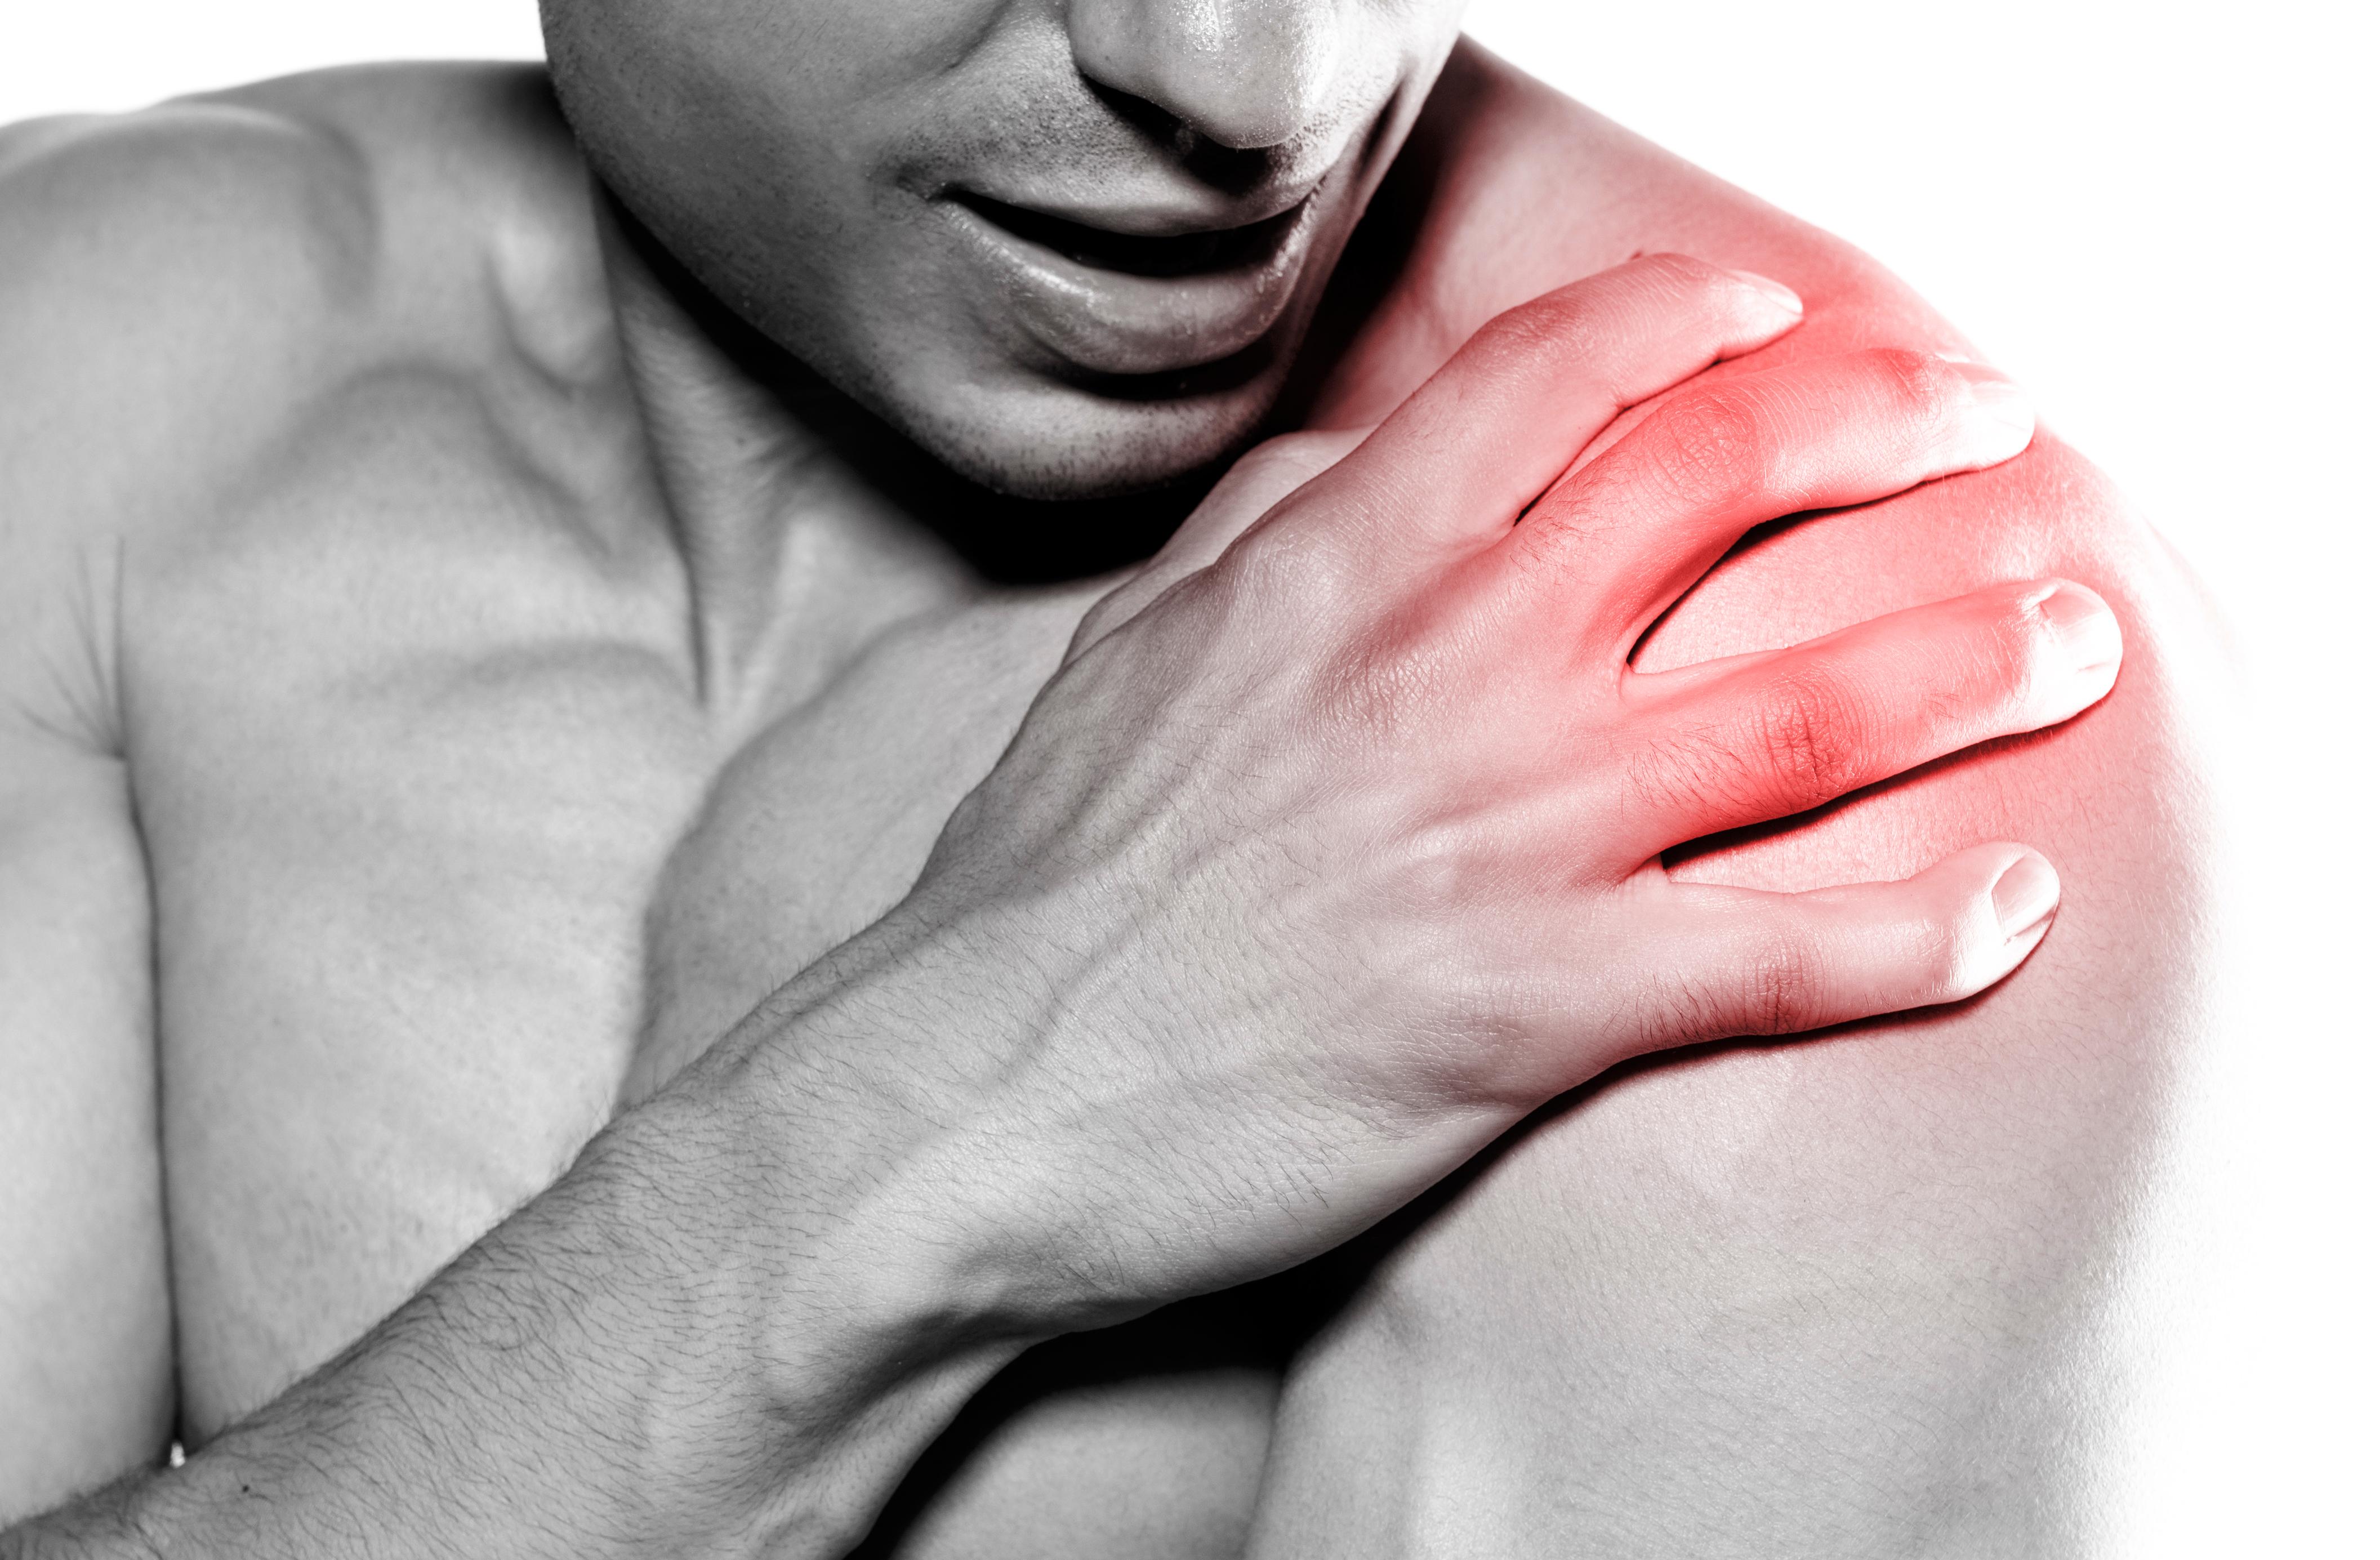 Rotator Cuff Injury Pain vs. Biceps Tendonitis: Comparison